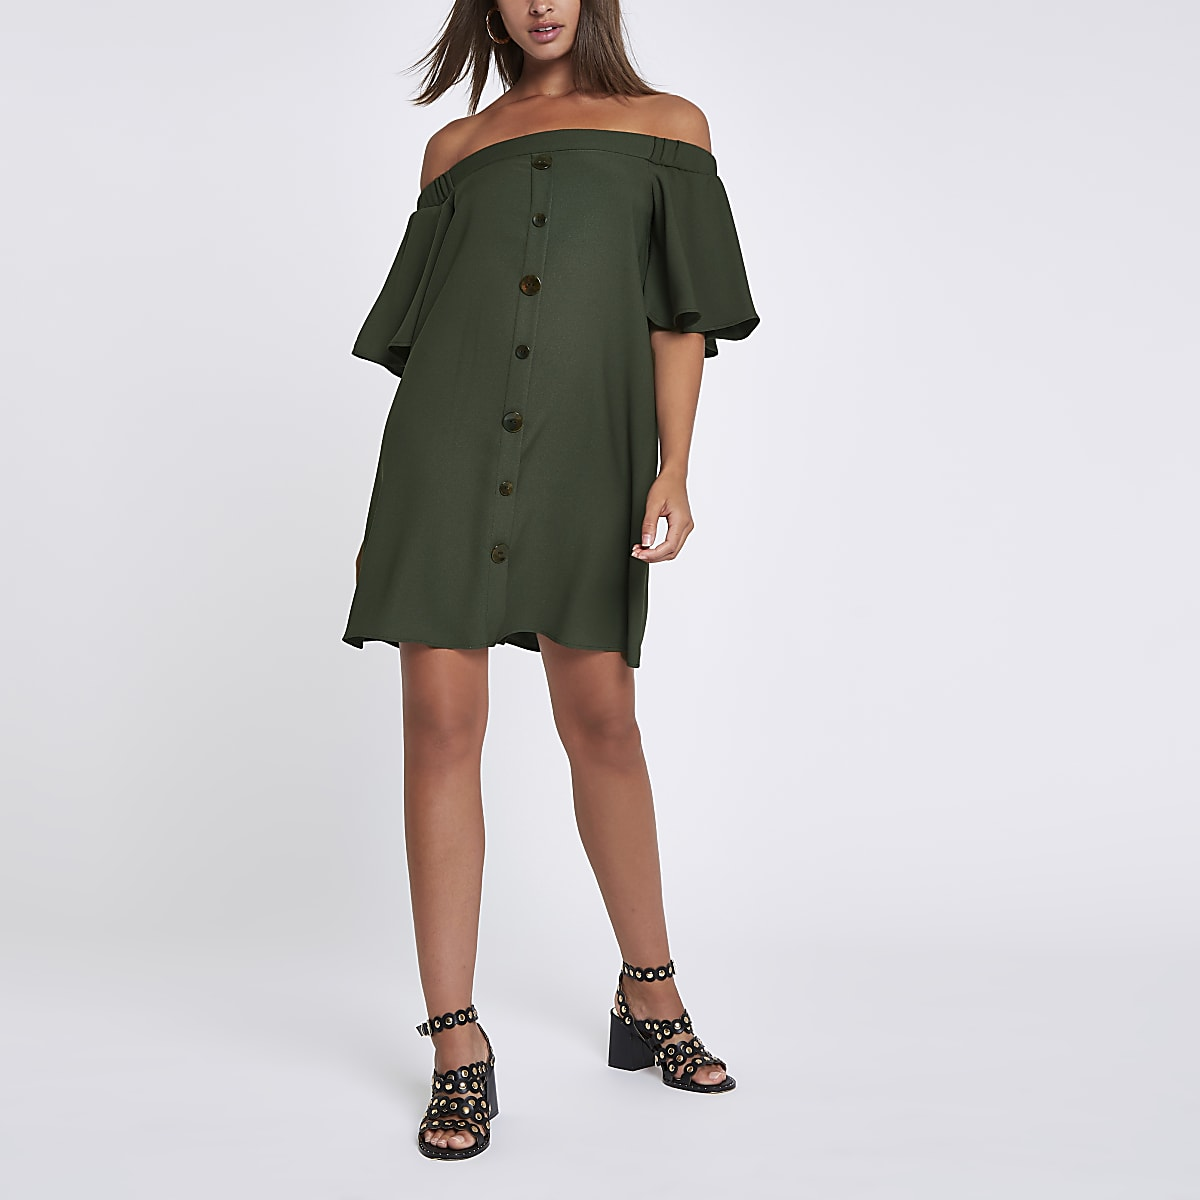 Khaki button front bardot swing dress